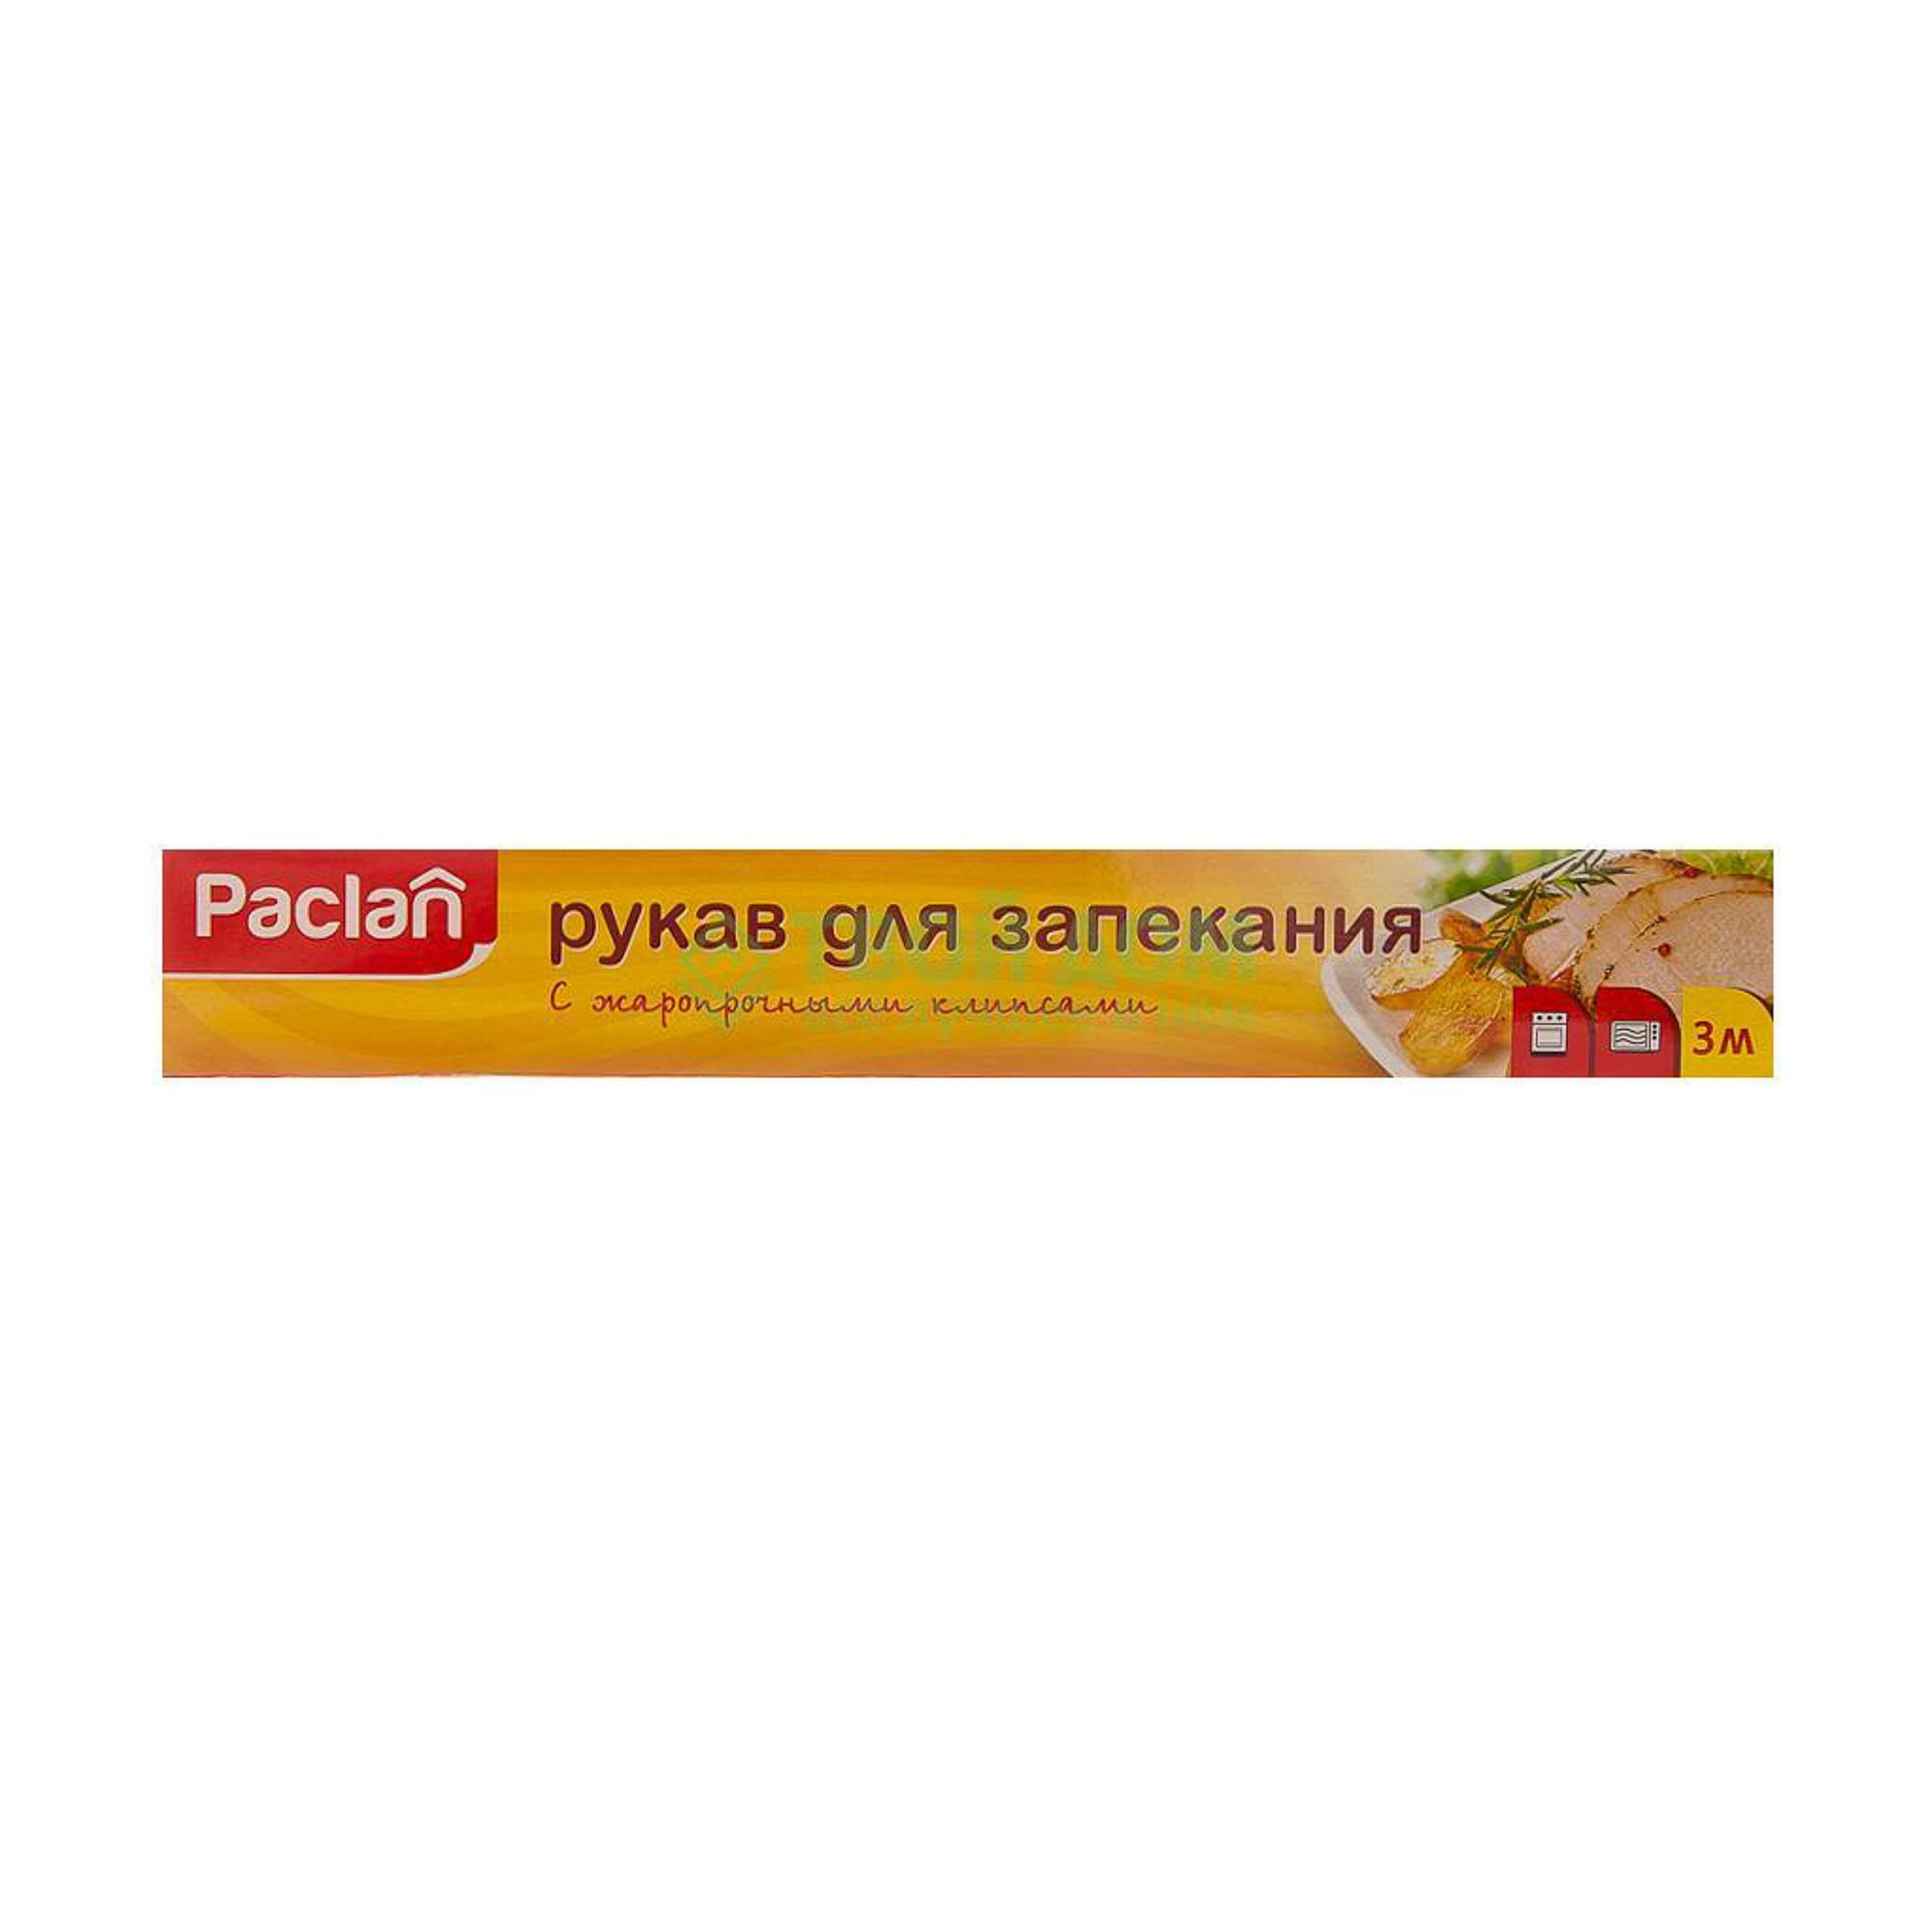 Paclan Рукав для запекания с клипсами 3мх30см